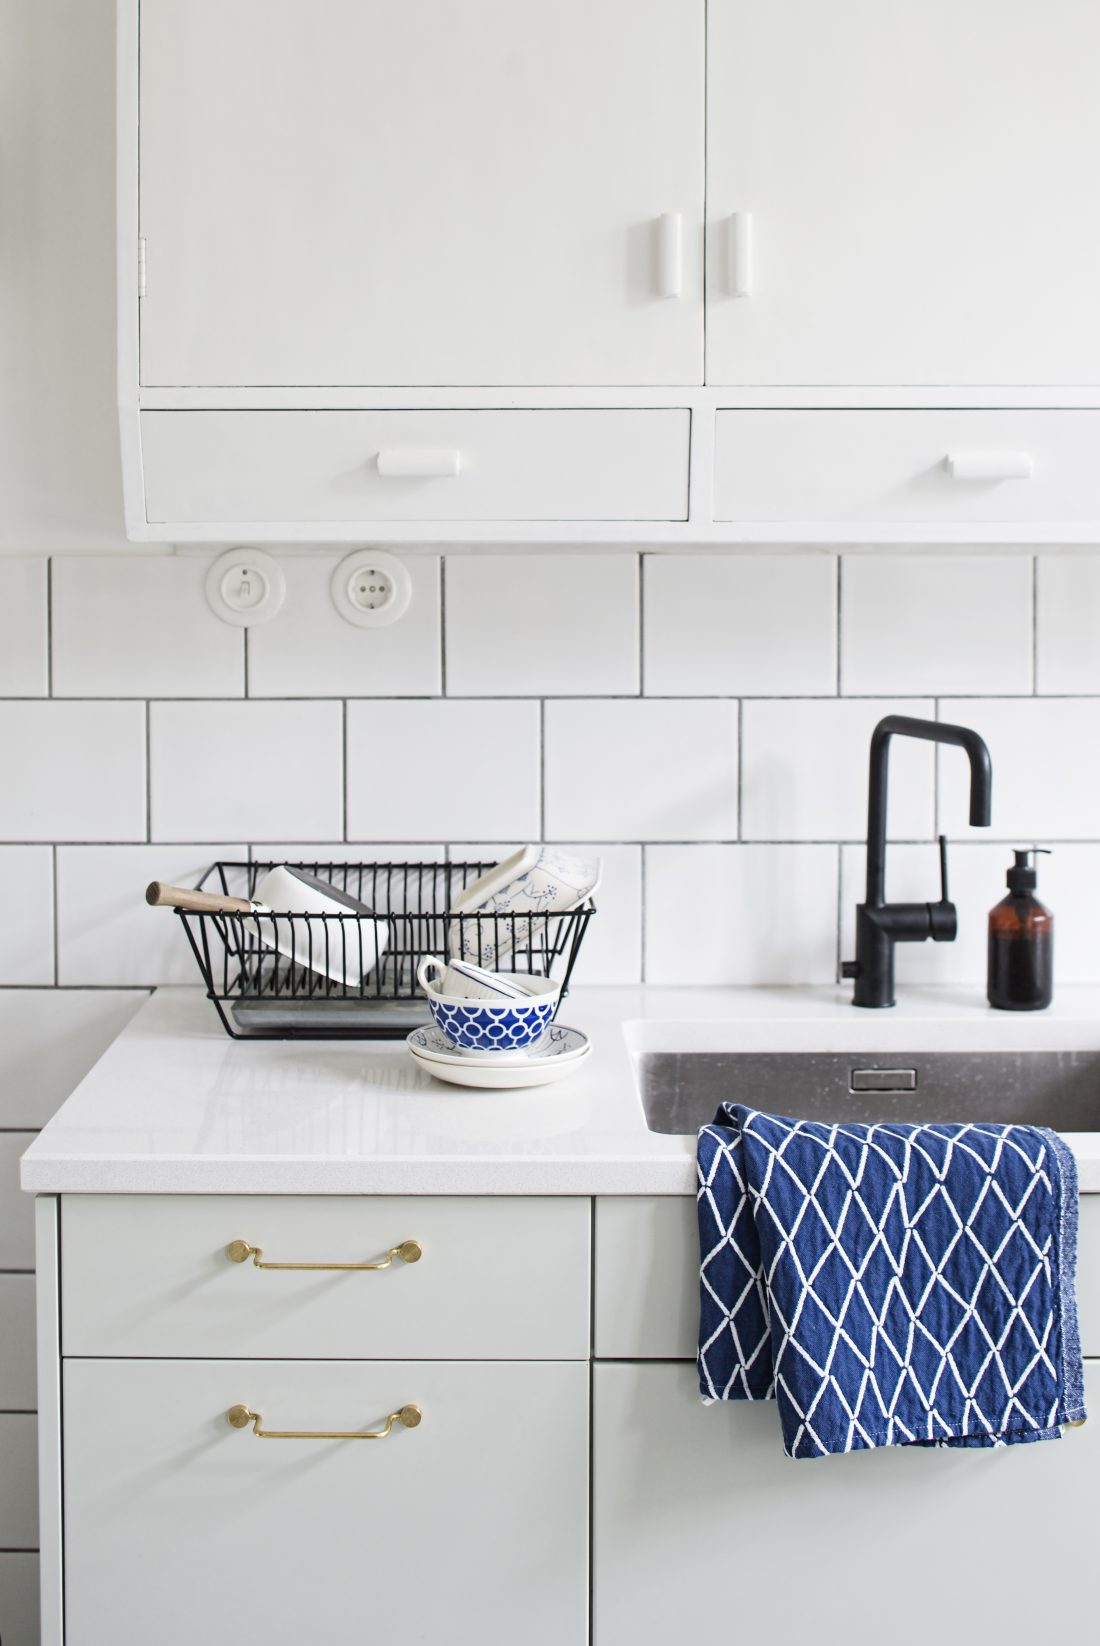 Katinka Kreative kitchen teacups and sink sustainable design